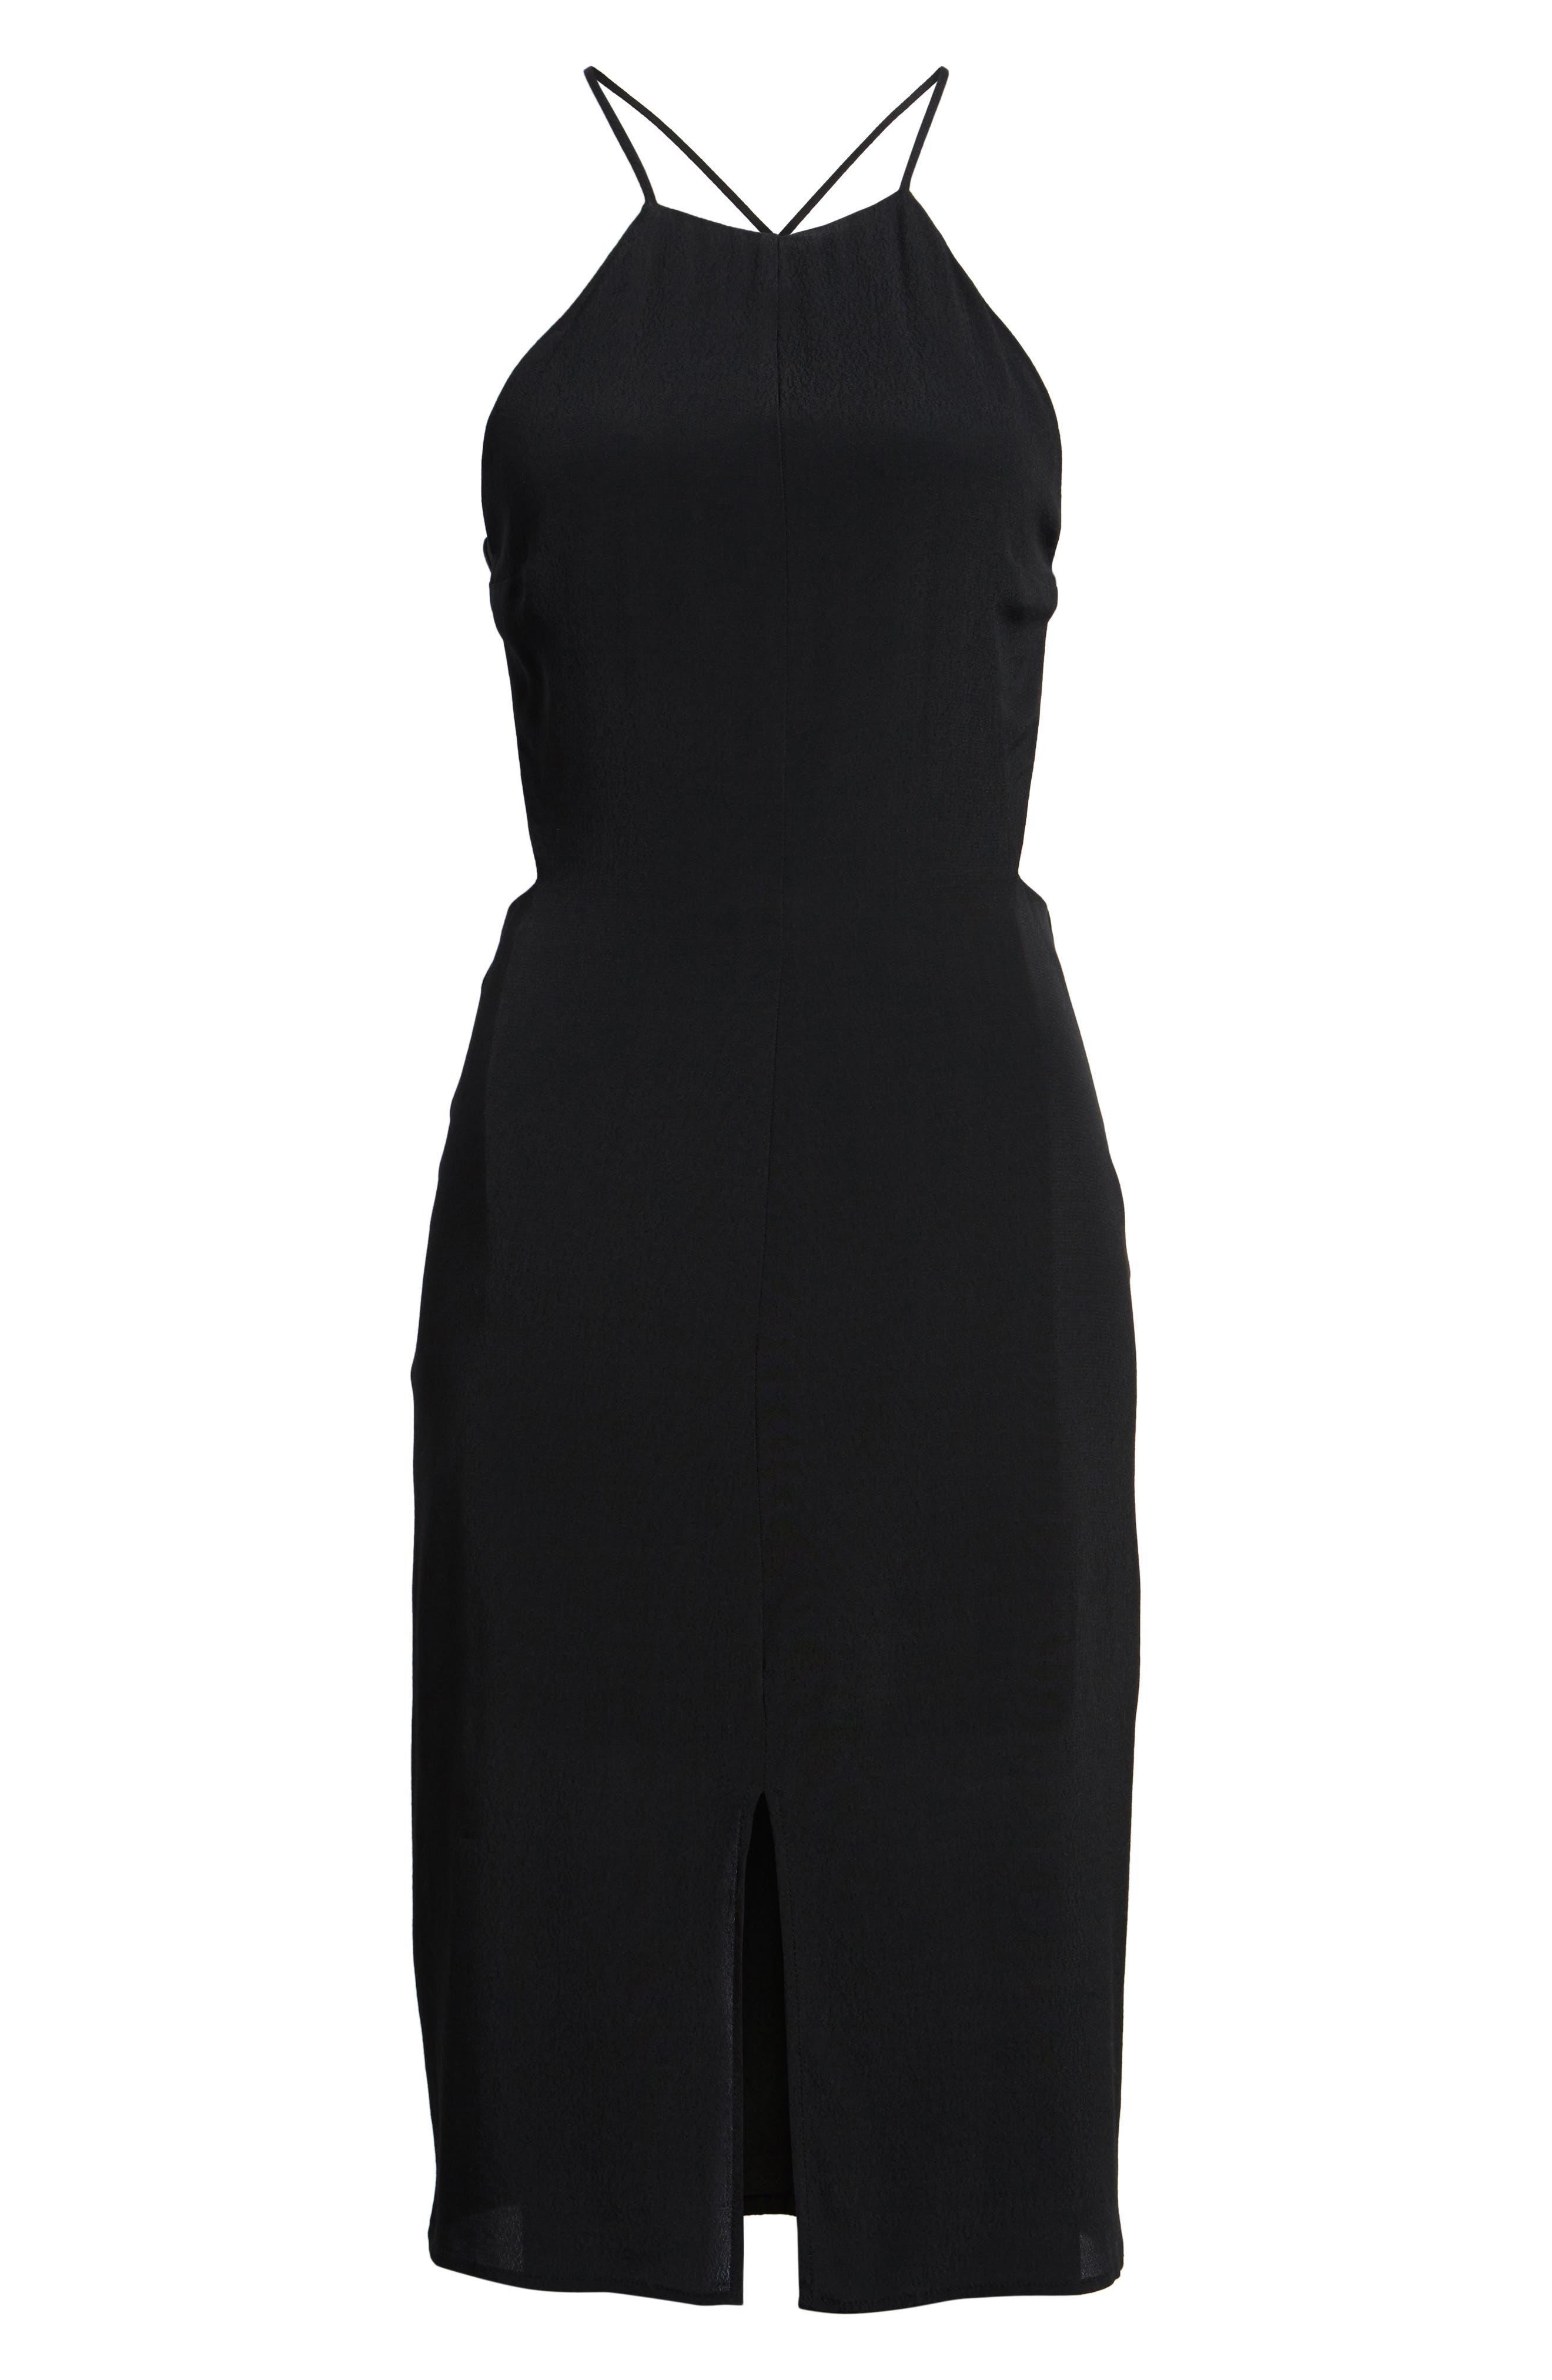 Backless Sheath Dress,                             Alternate thumbnail 6, color,                             Black